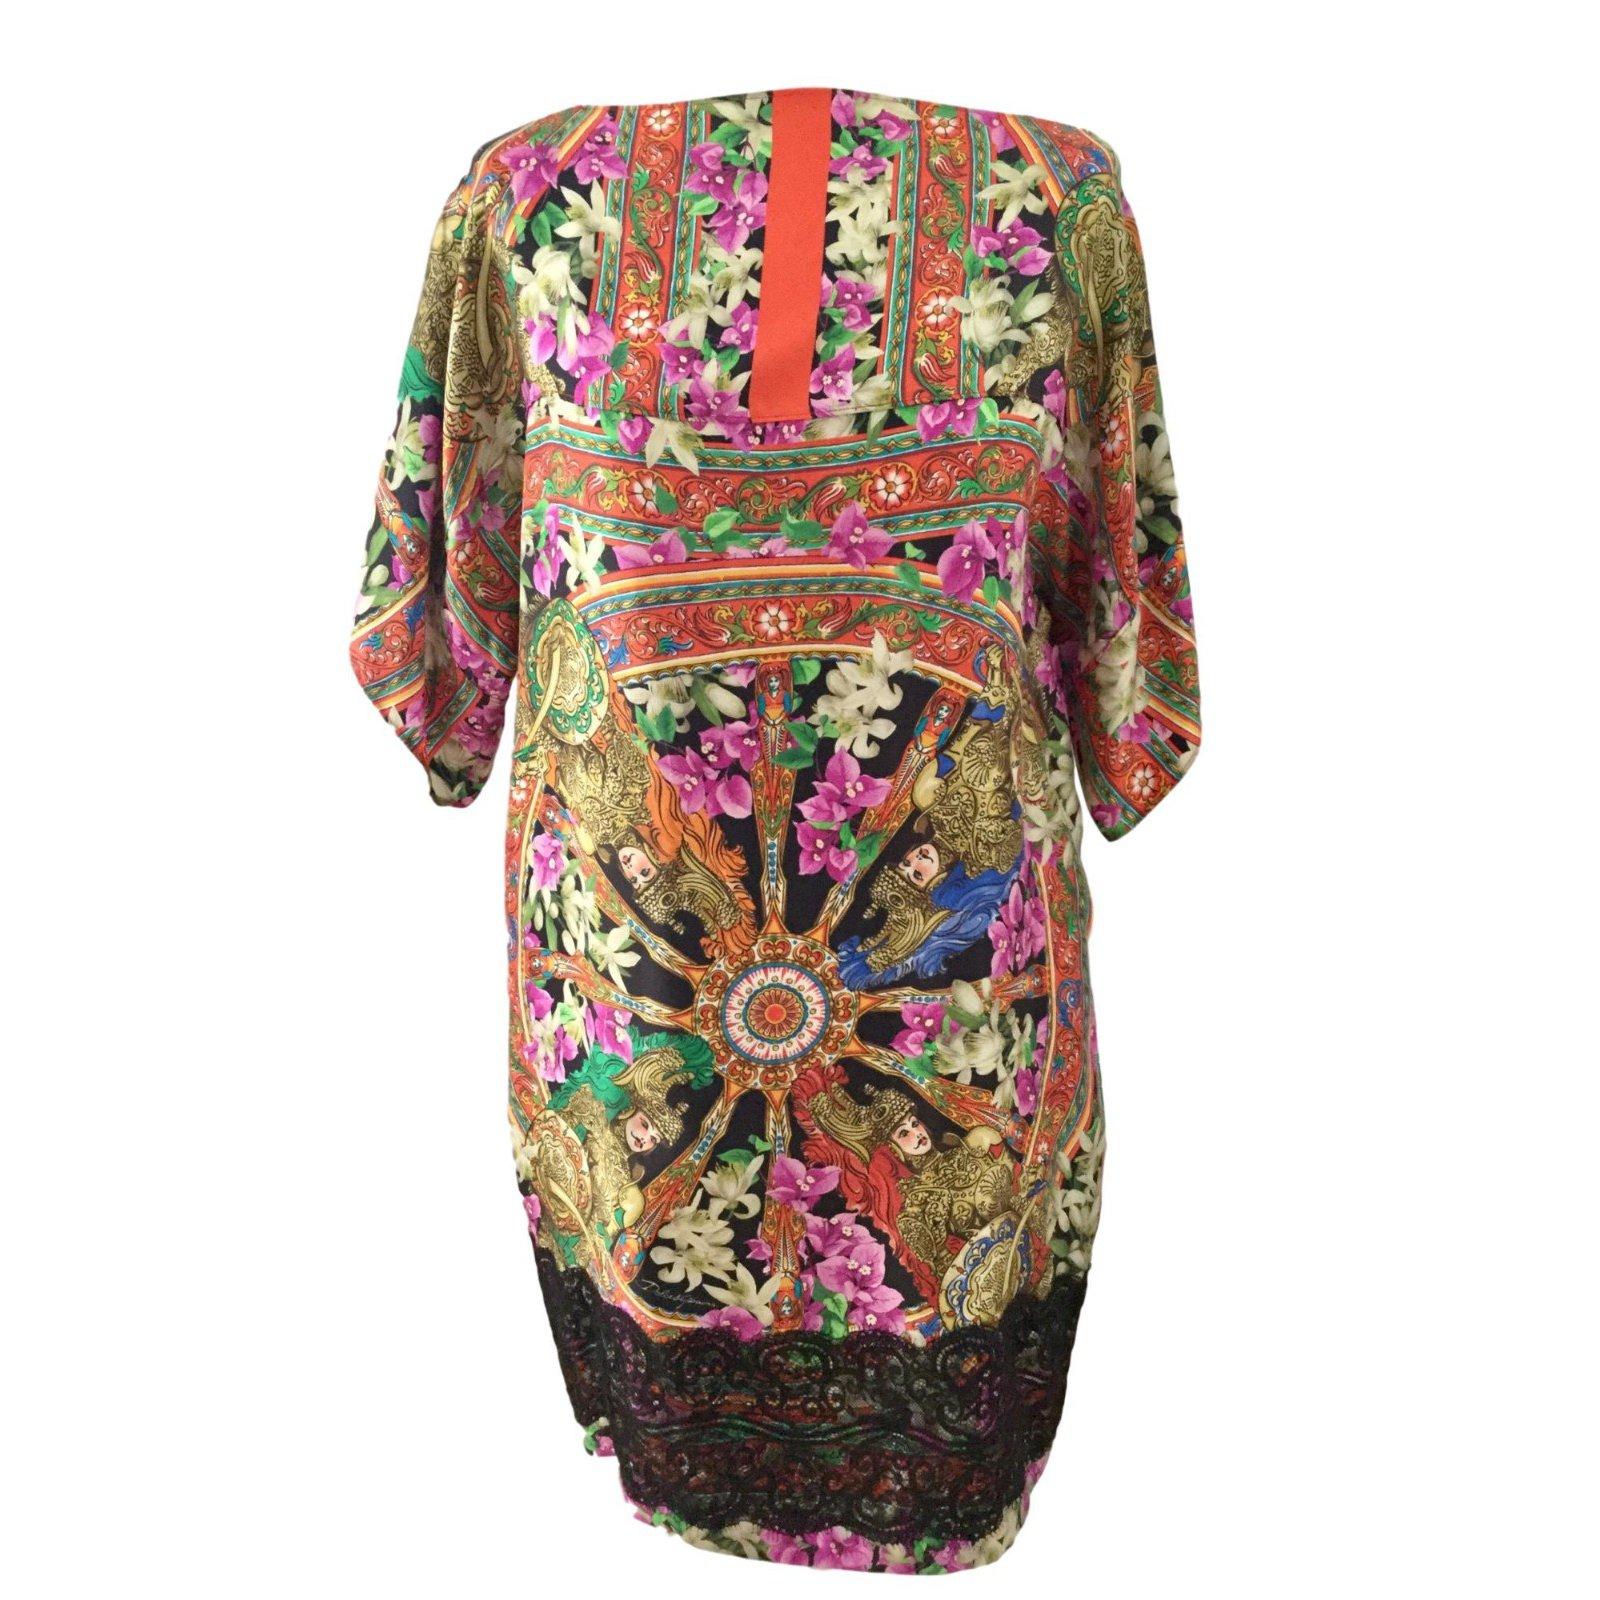 64b20e9f Dolce & Gabbana Dresses Dresses Silk Multiple colors ref.62870 ...